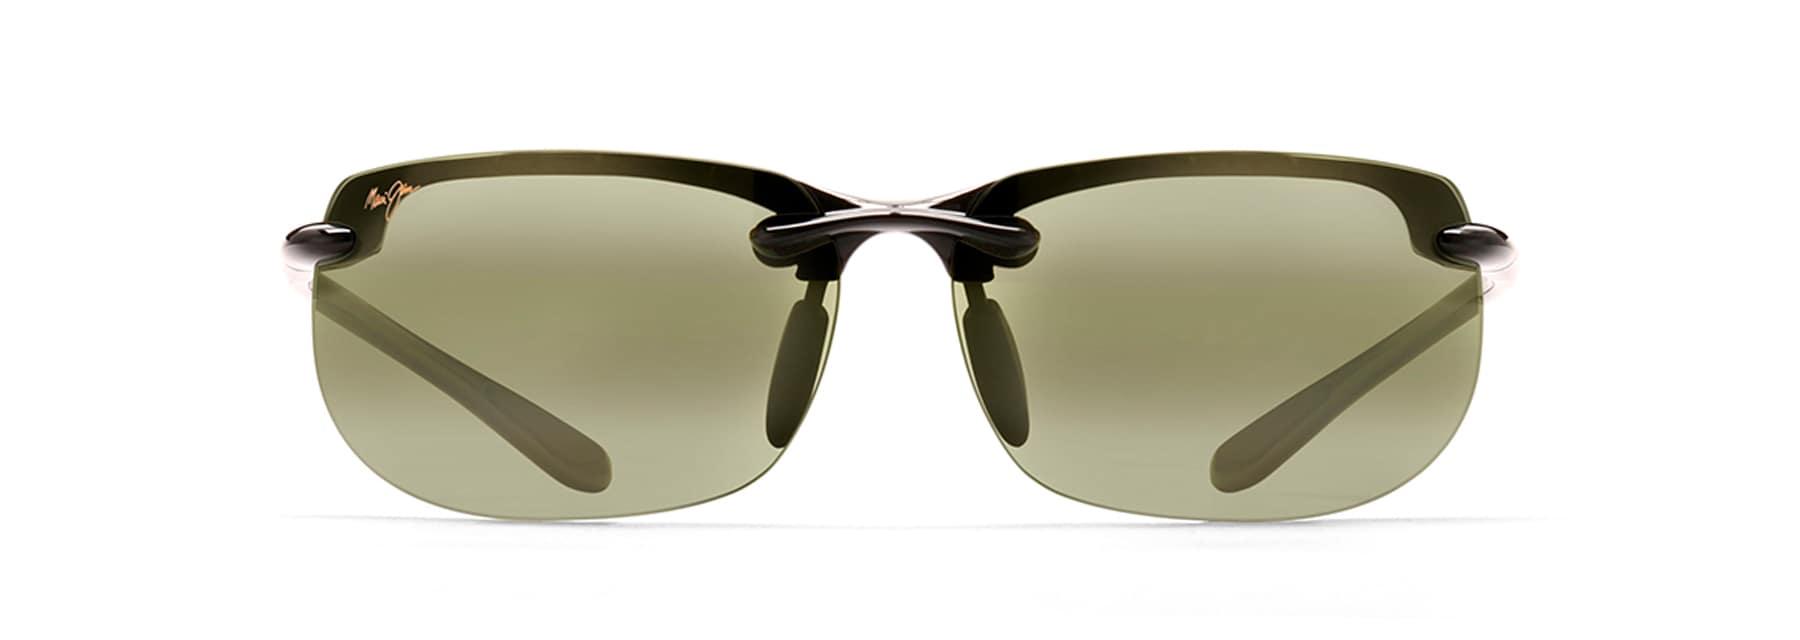 09c5c595a58a Banyans Polarised Sunglasses | Maui Jim®